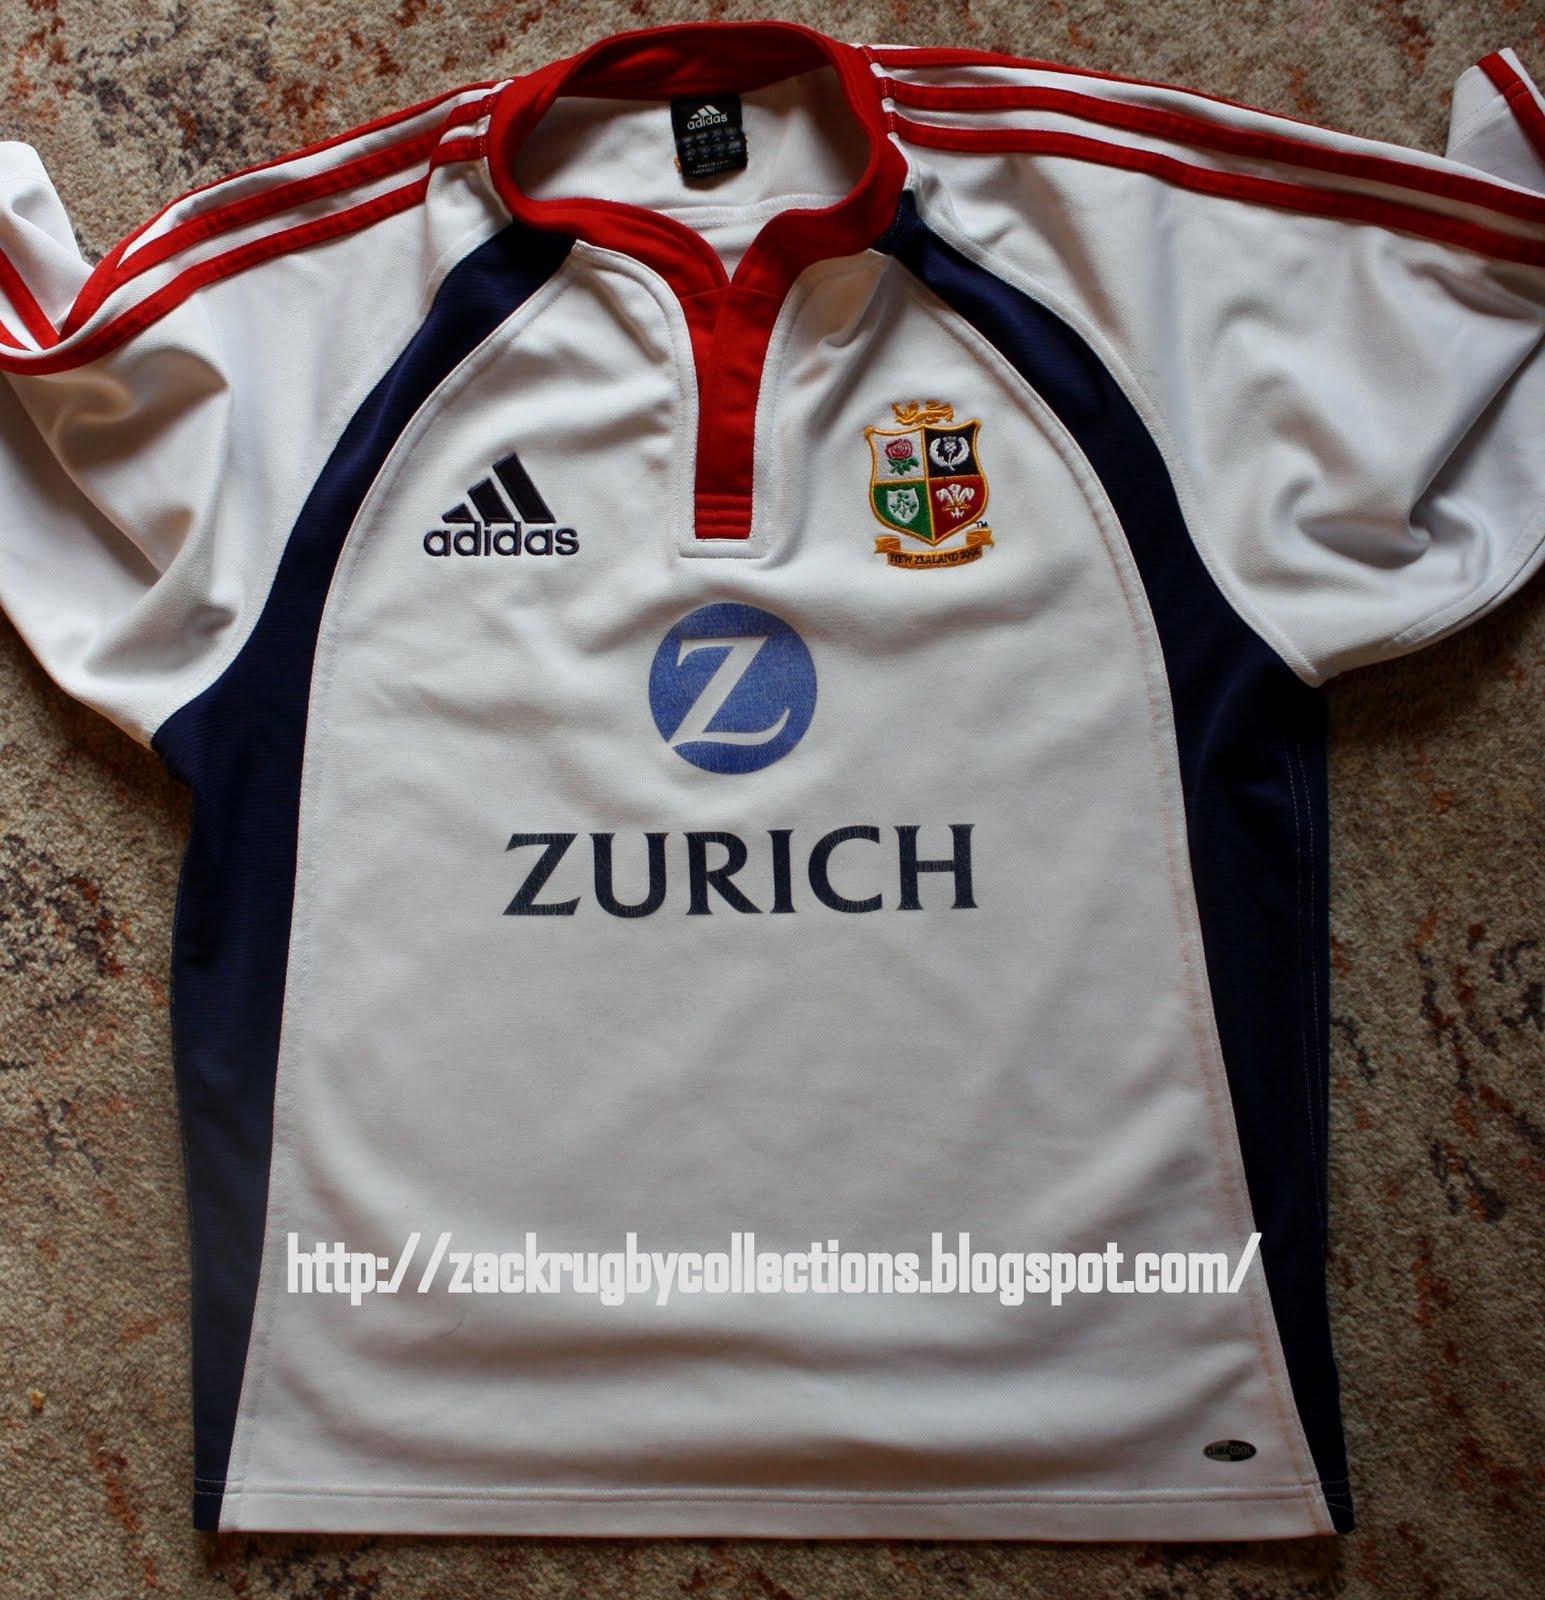 Chùm ảnh: Zurich jersey (14)